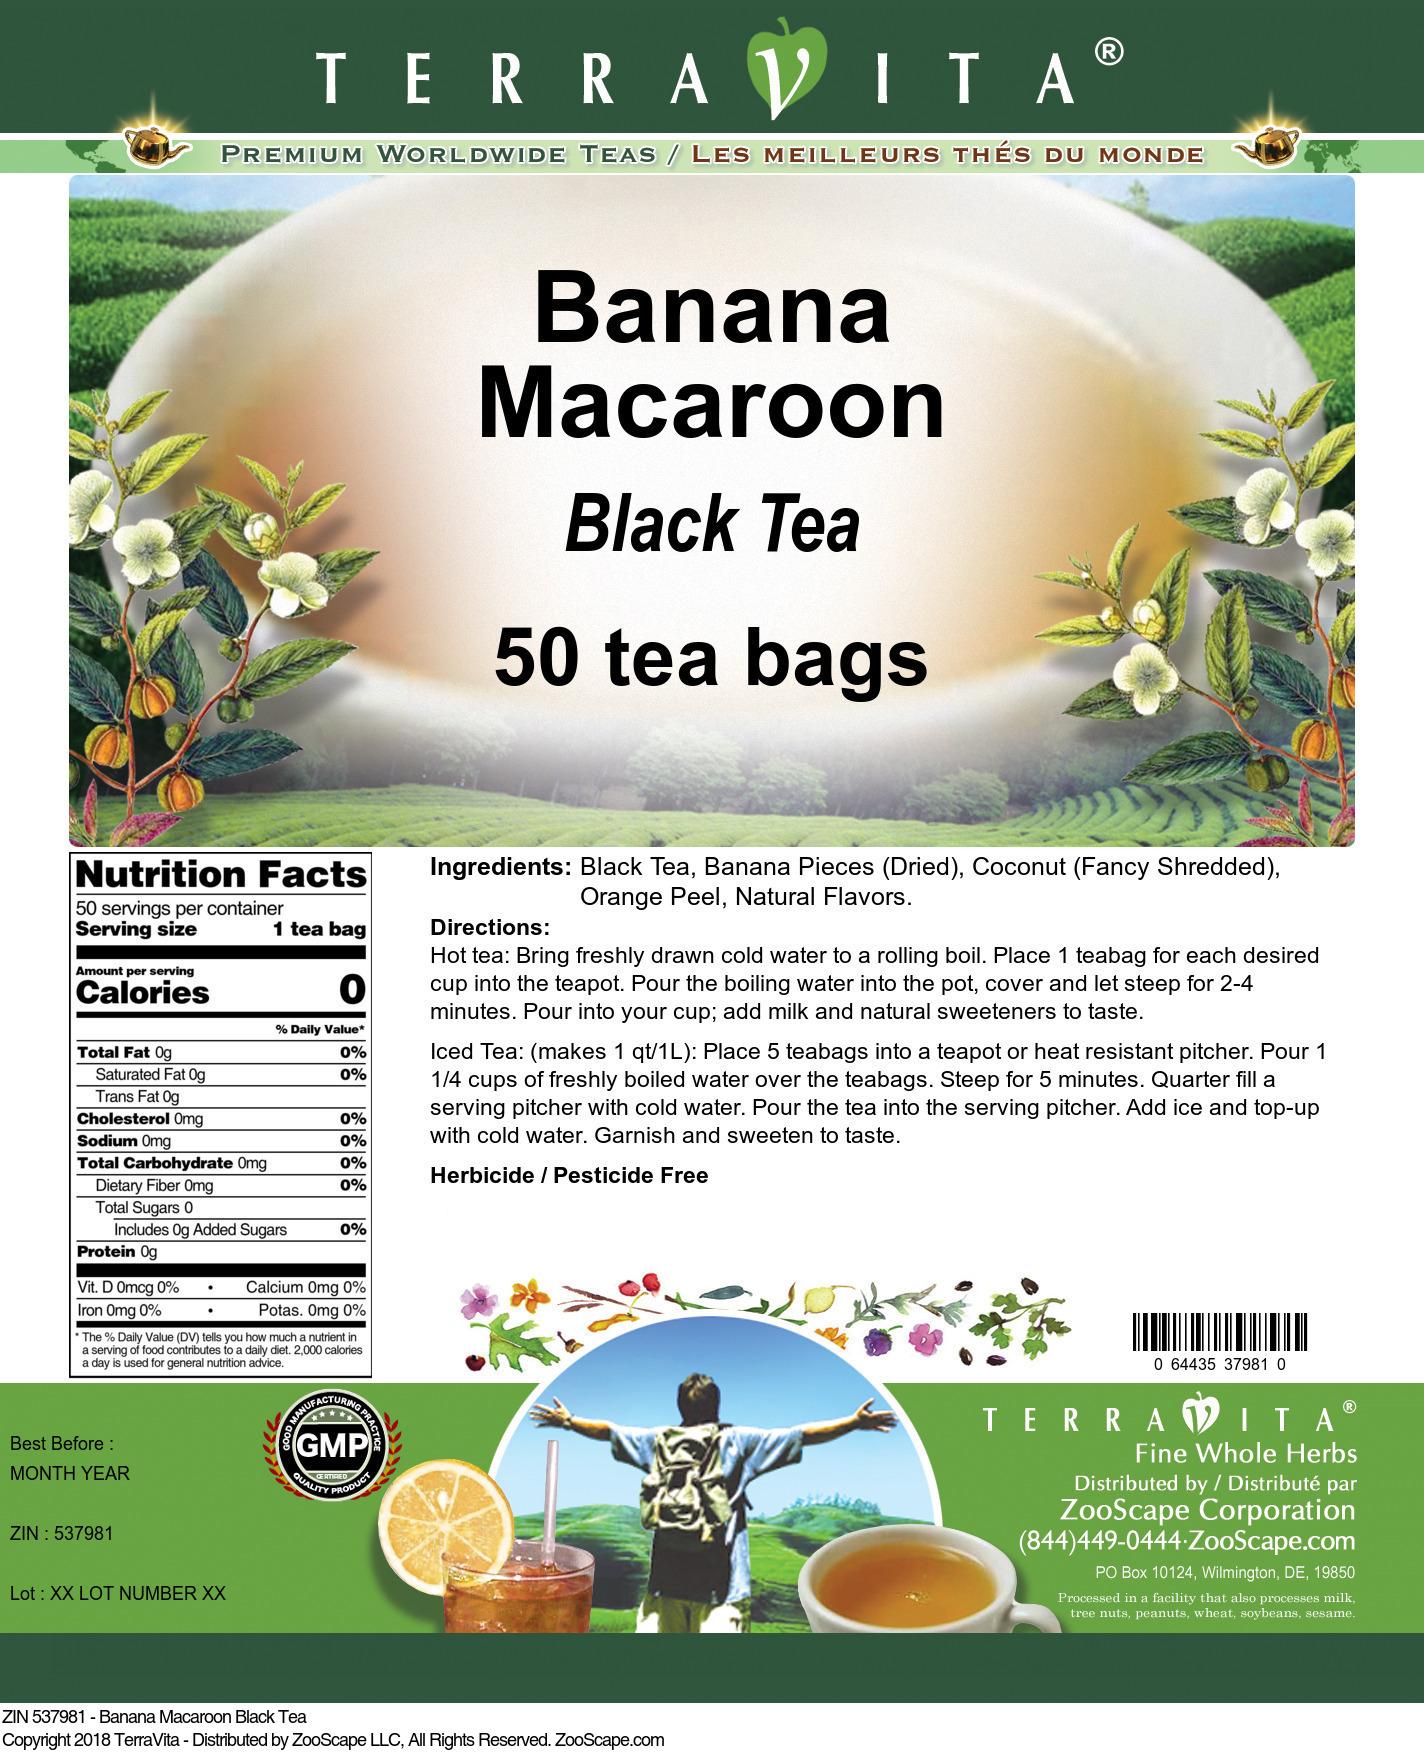 Banana Macaroon Black Tea